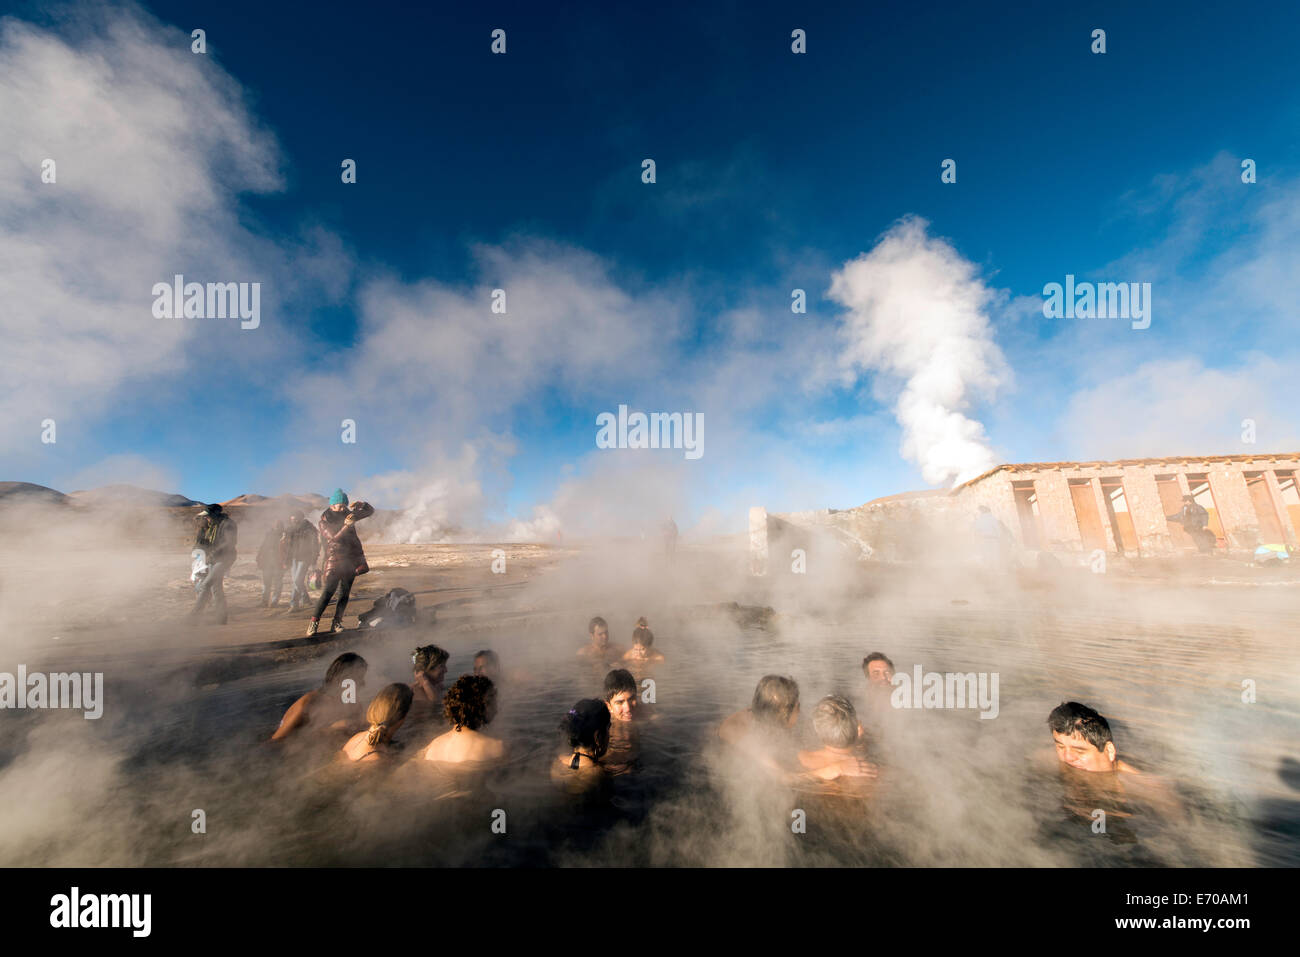 People bathing at Tatio Geysers Geothermal fields San Pedro de Atacama Chile South America - Stock Image